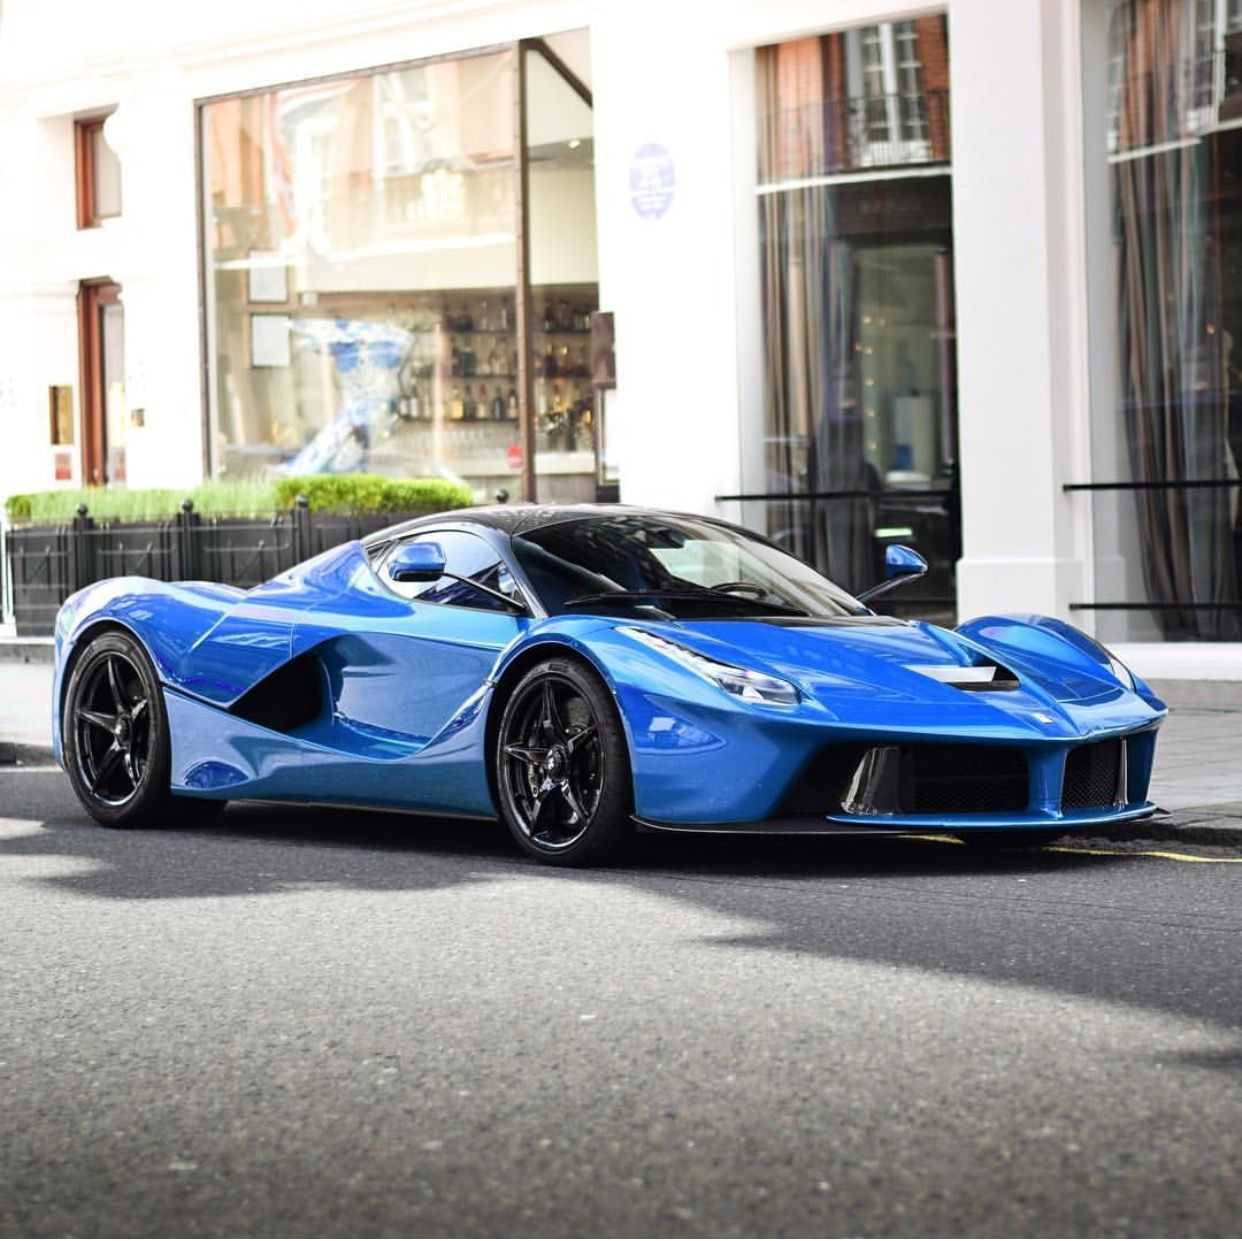 Laferrari: Ferrari LaFerrari Painted In Blue Photo Taken By: @dtab3